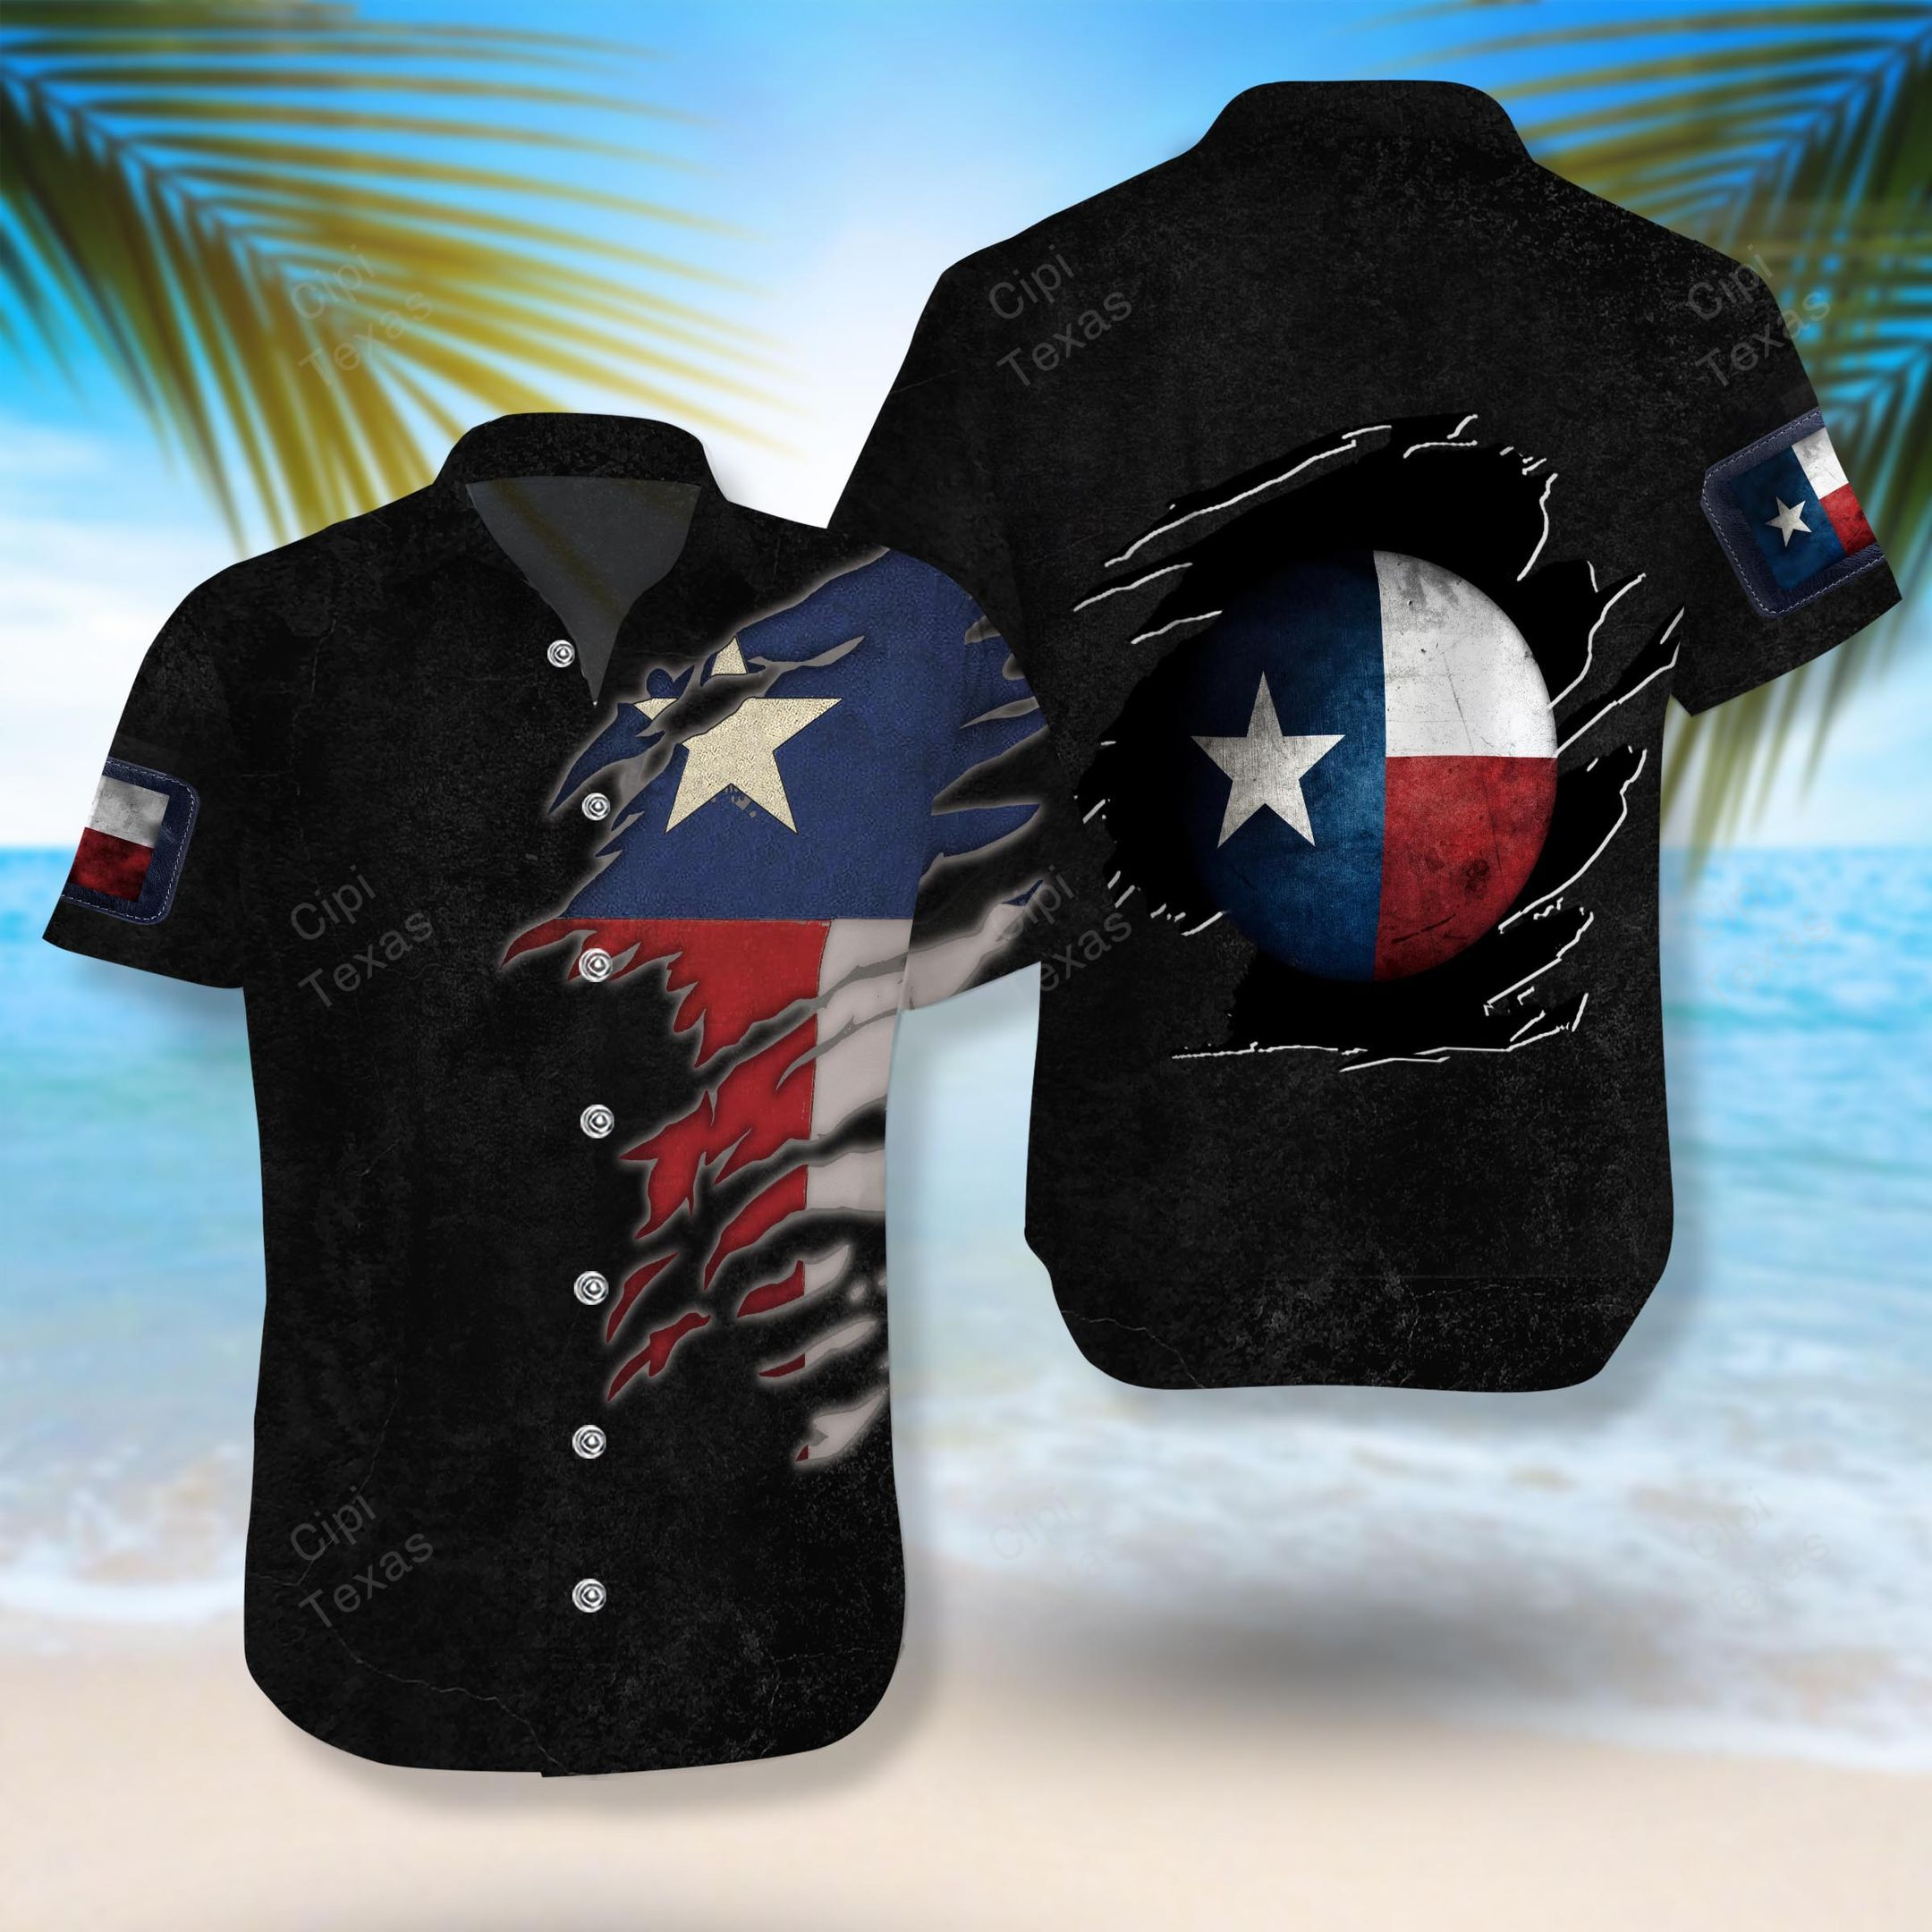 The Lone Star State Texas flag Black Hawaiian Shirt Summer Shirt